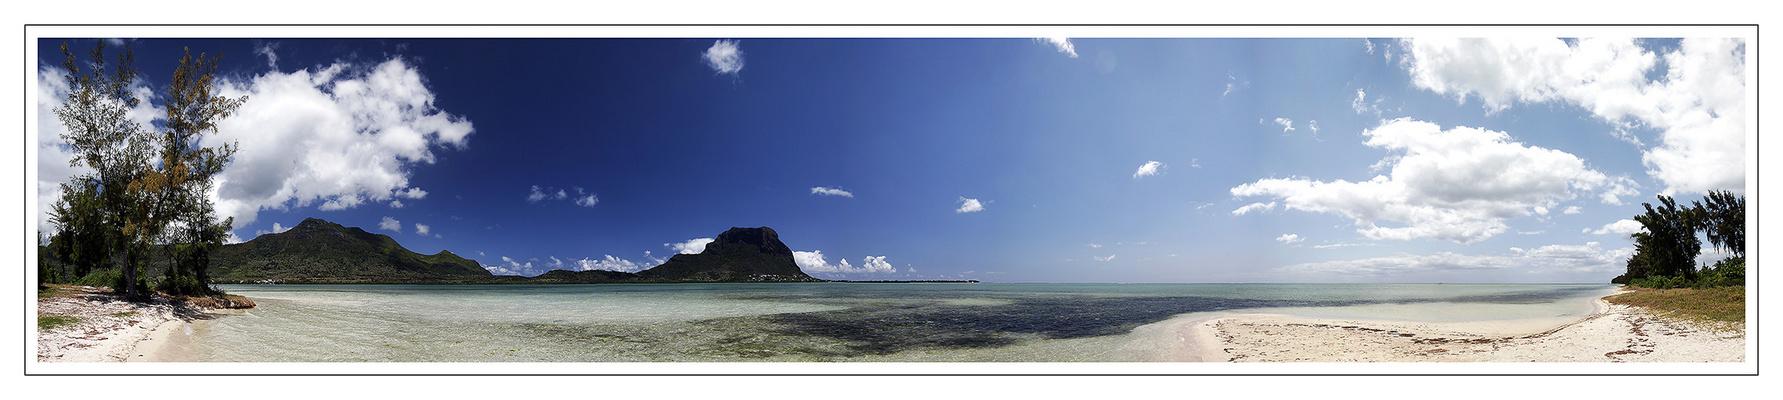 Mauritius III - The Island